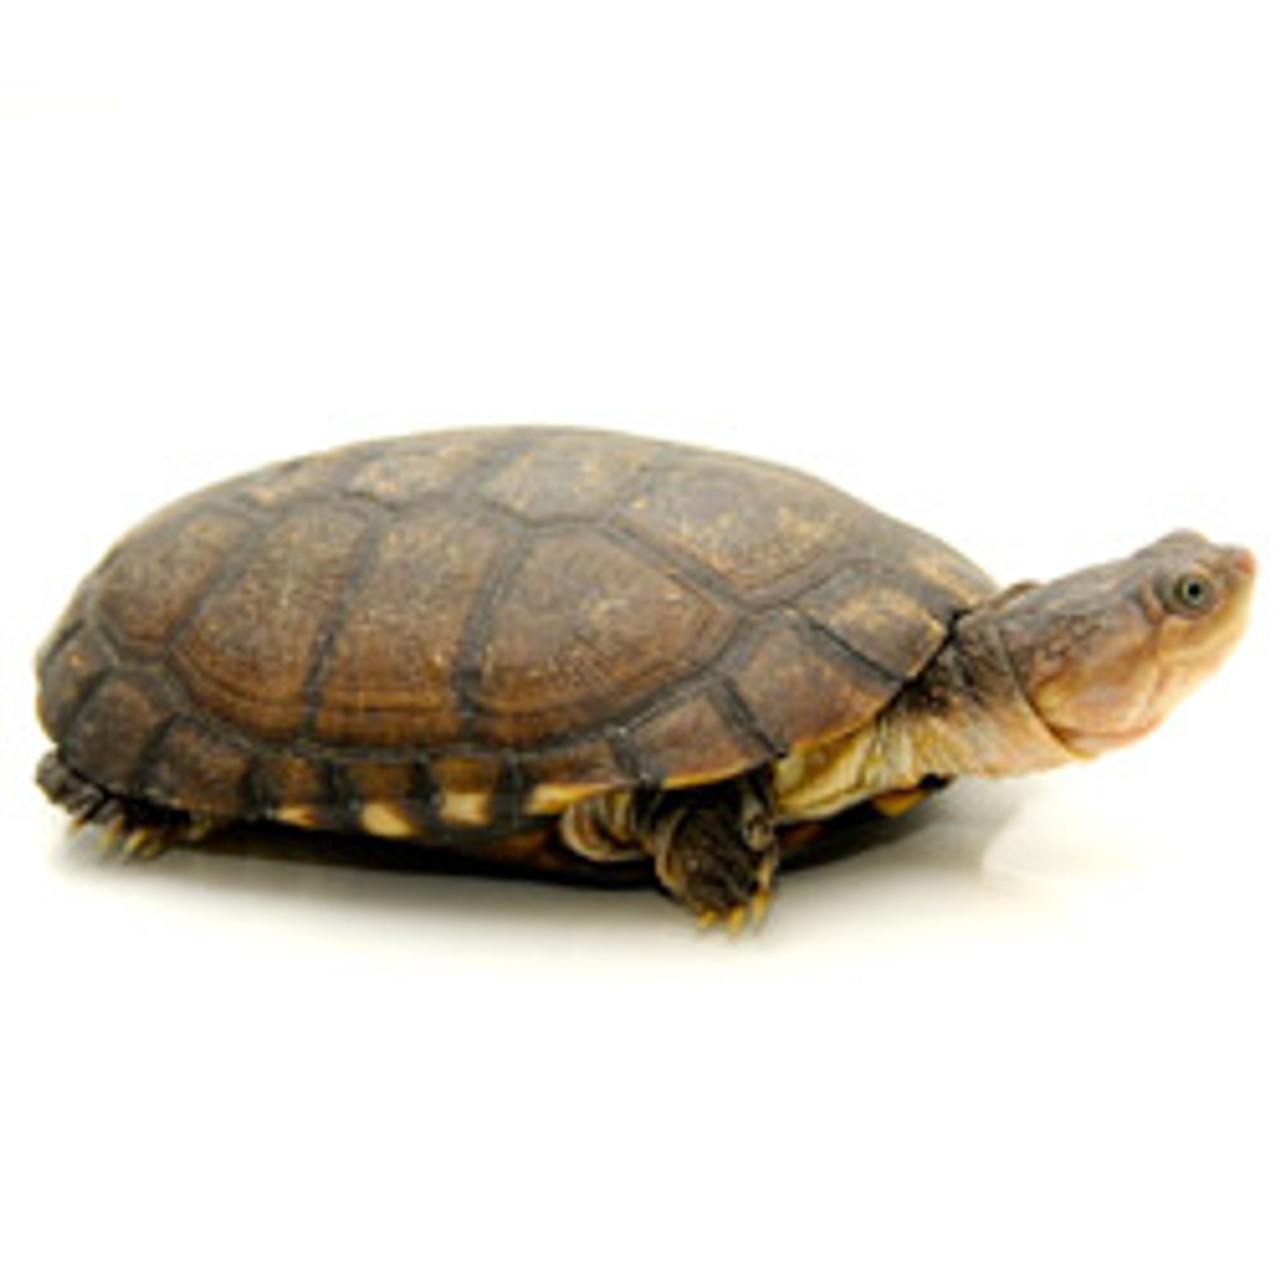 African Side-Neck Turtle (Pelusios castaneus/subrufa)